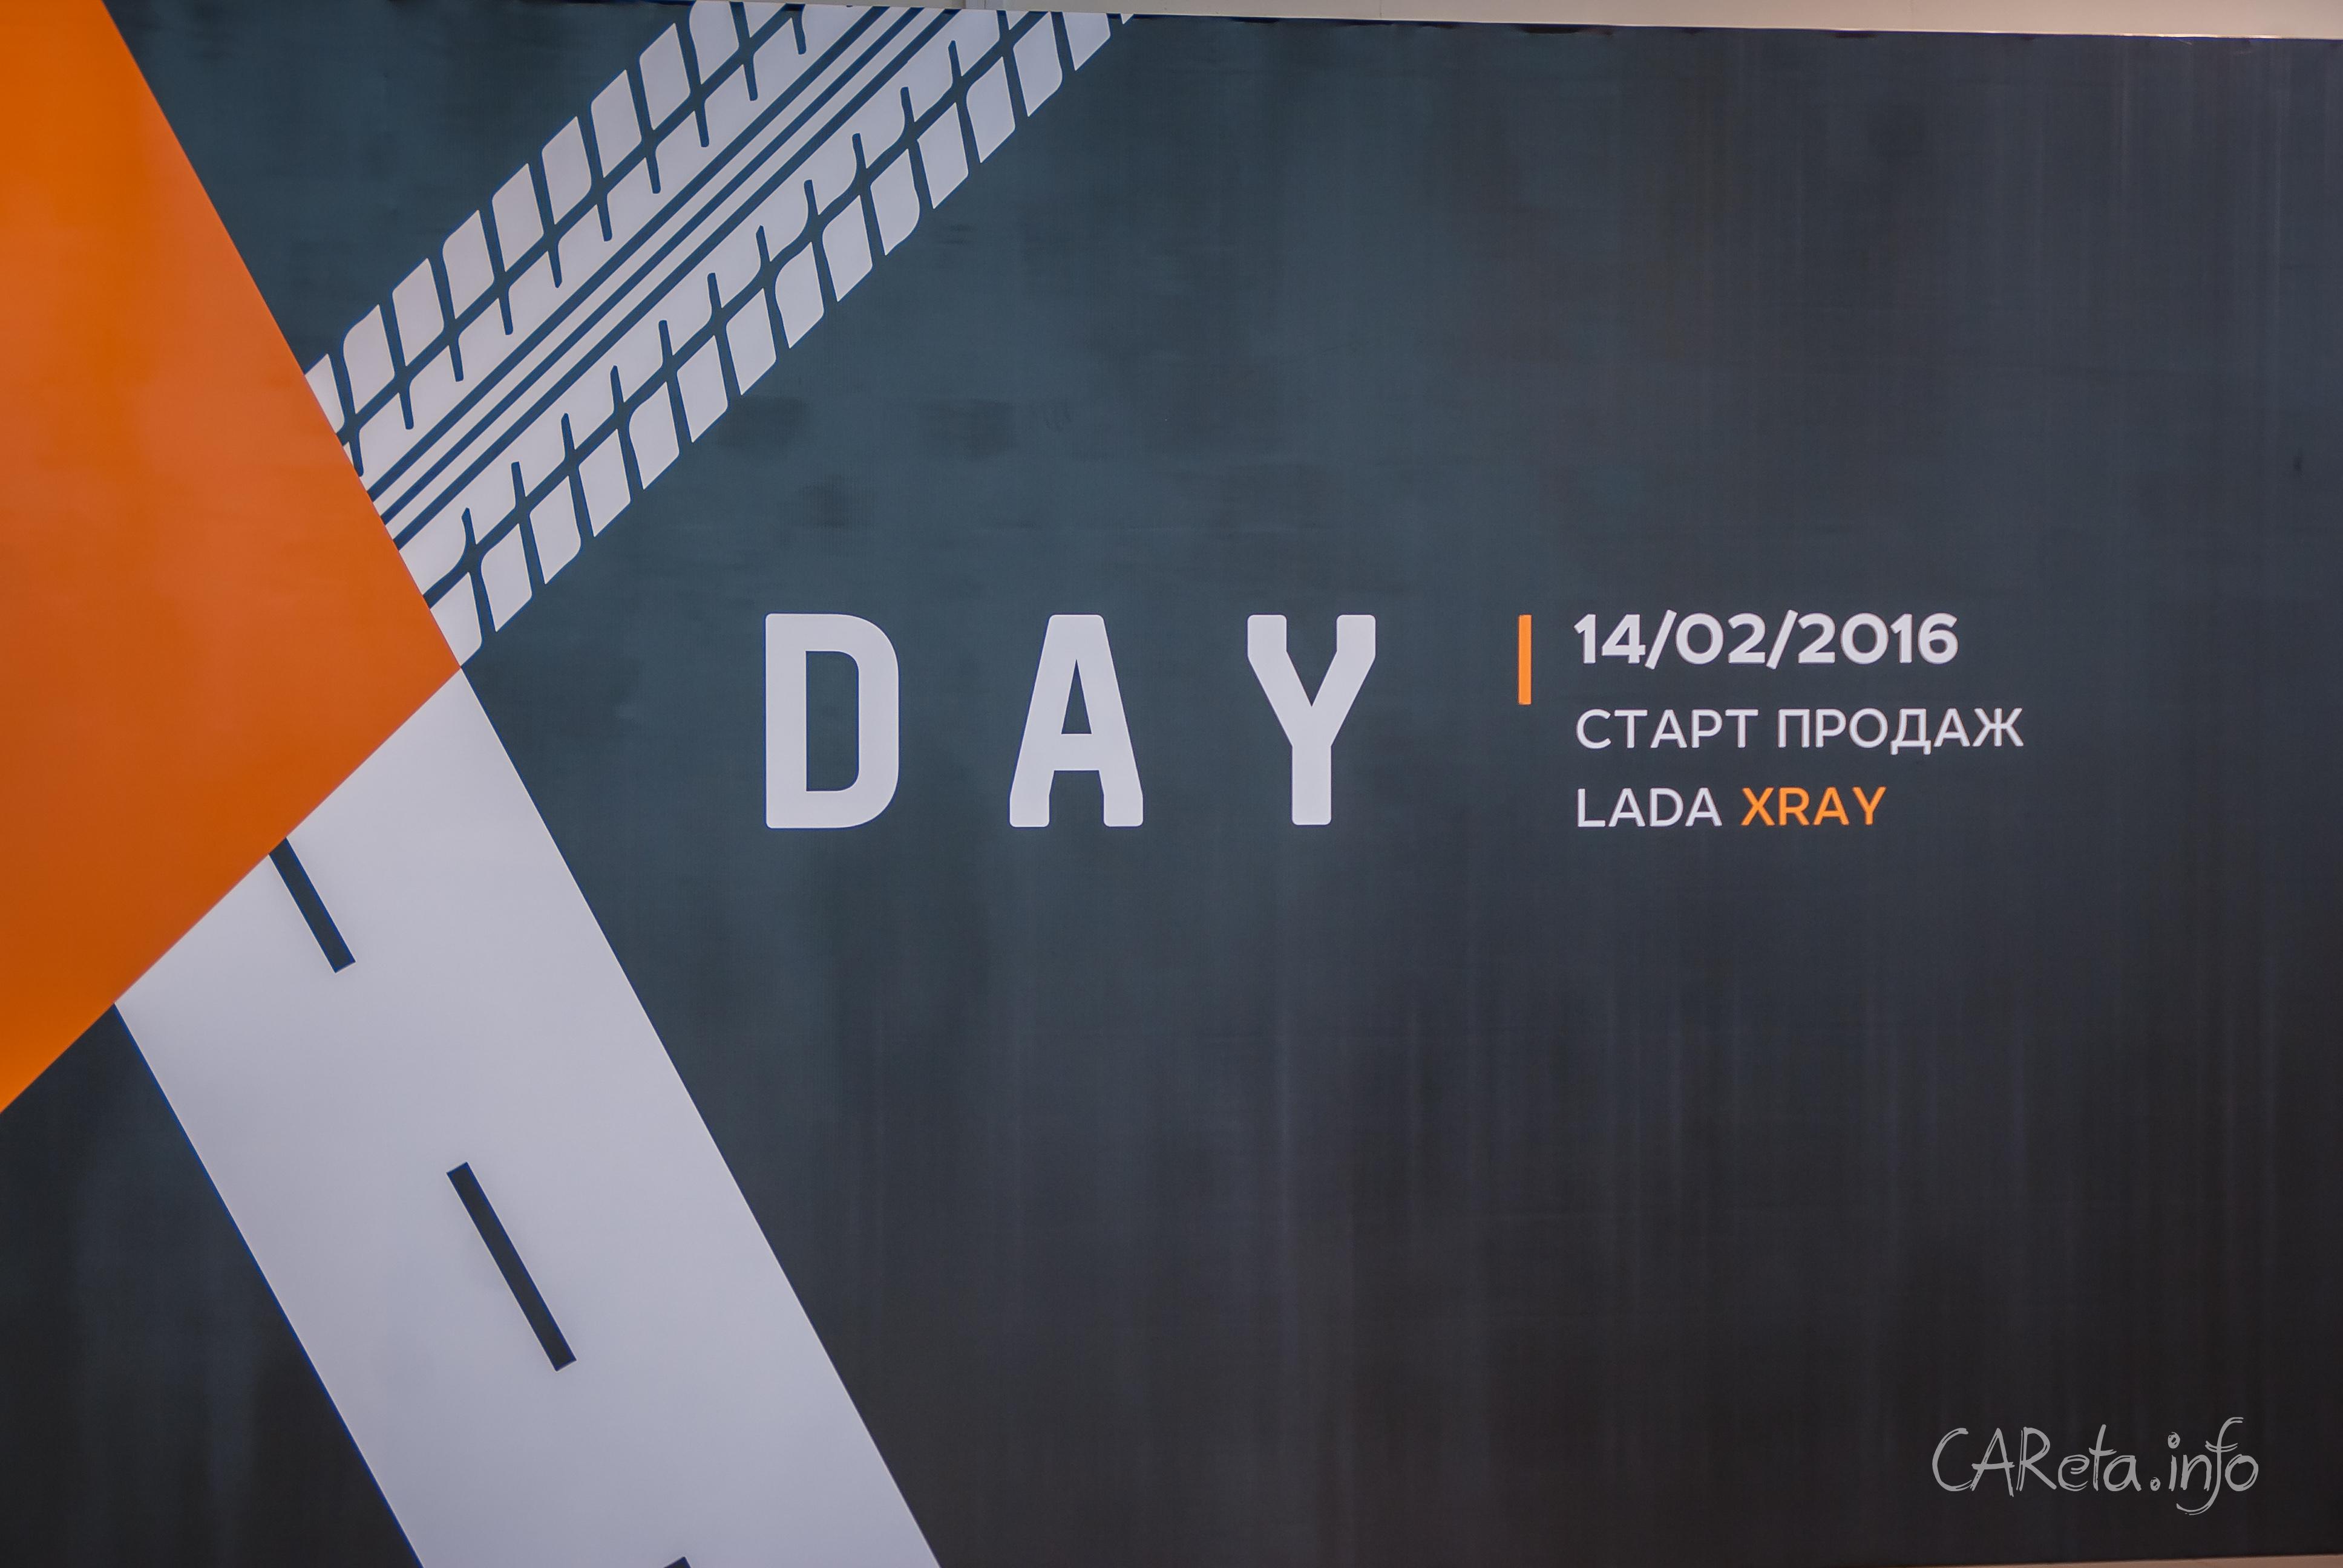 День Икс: начало продаж LADA XRAY